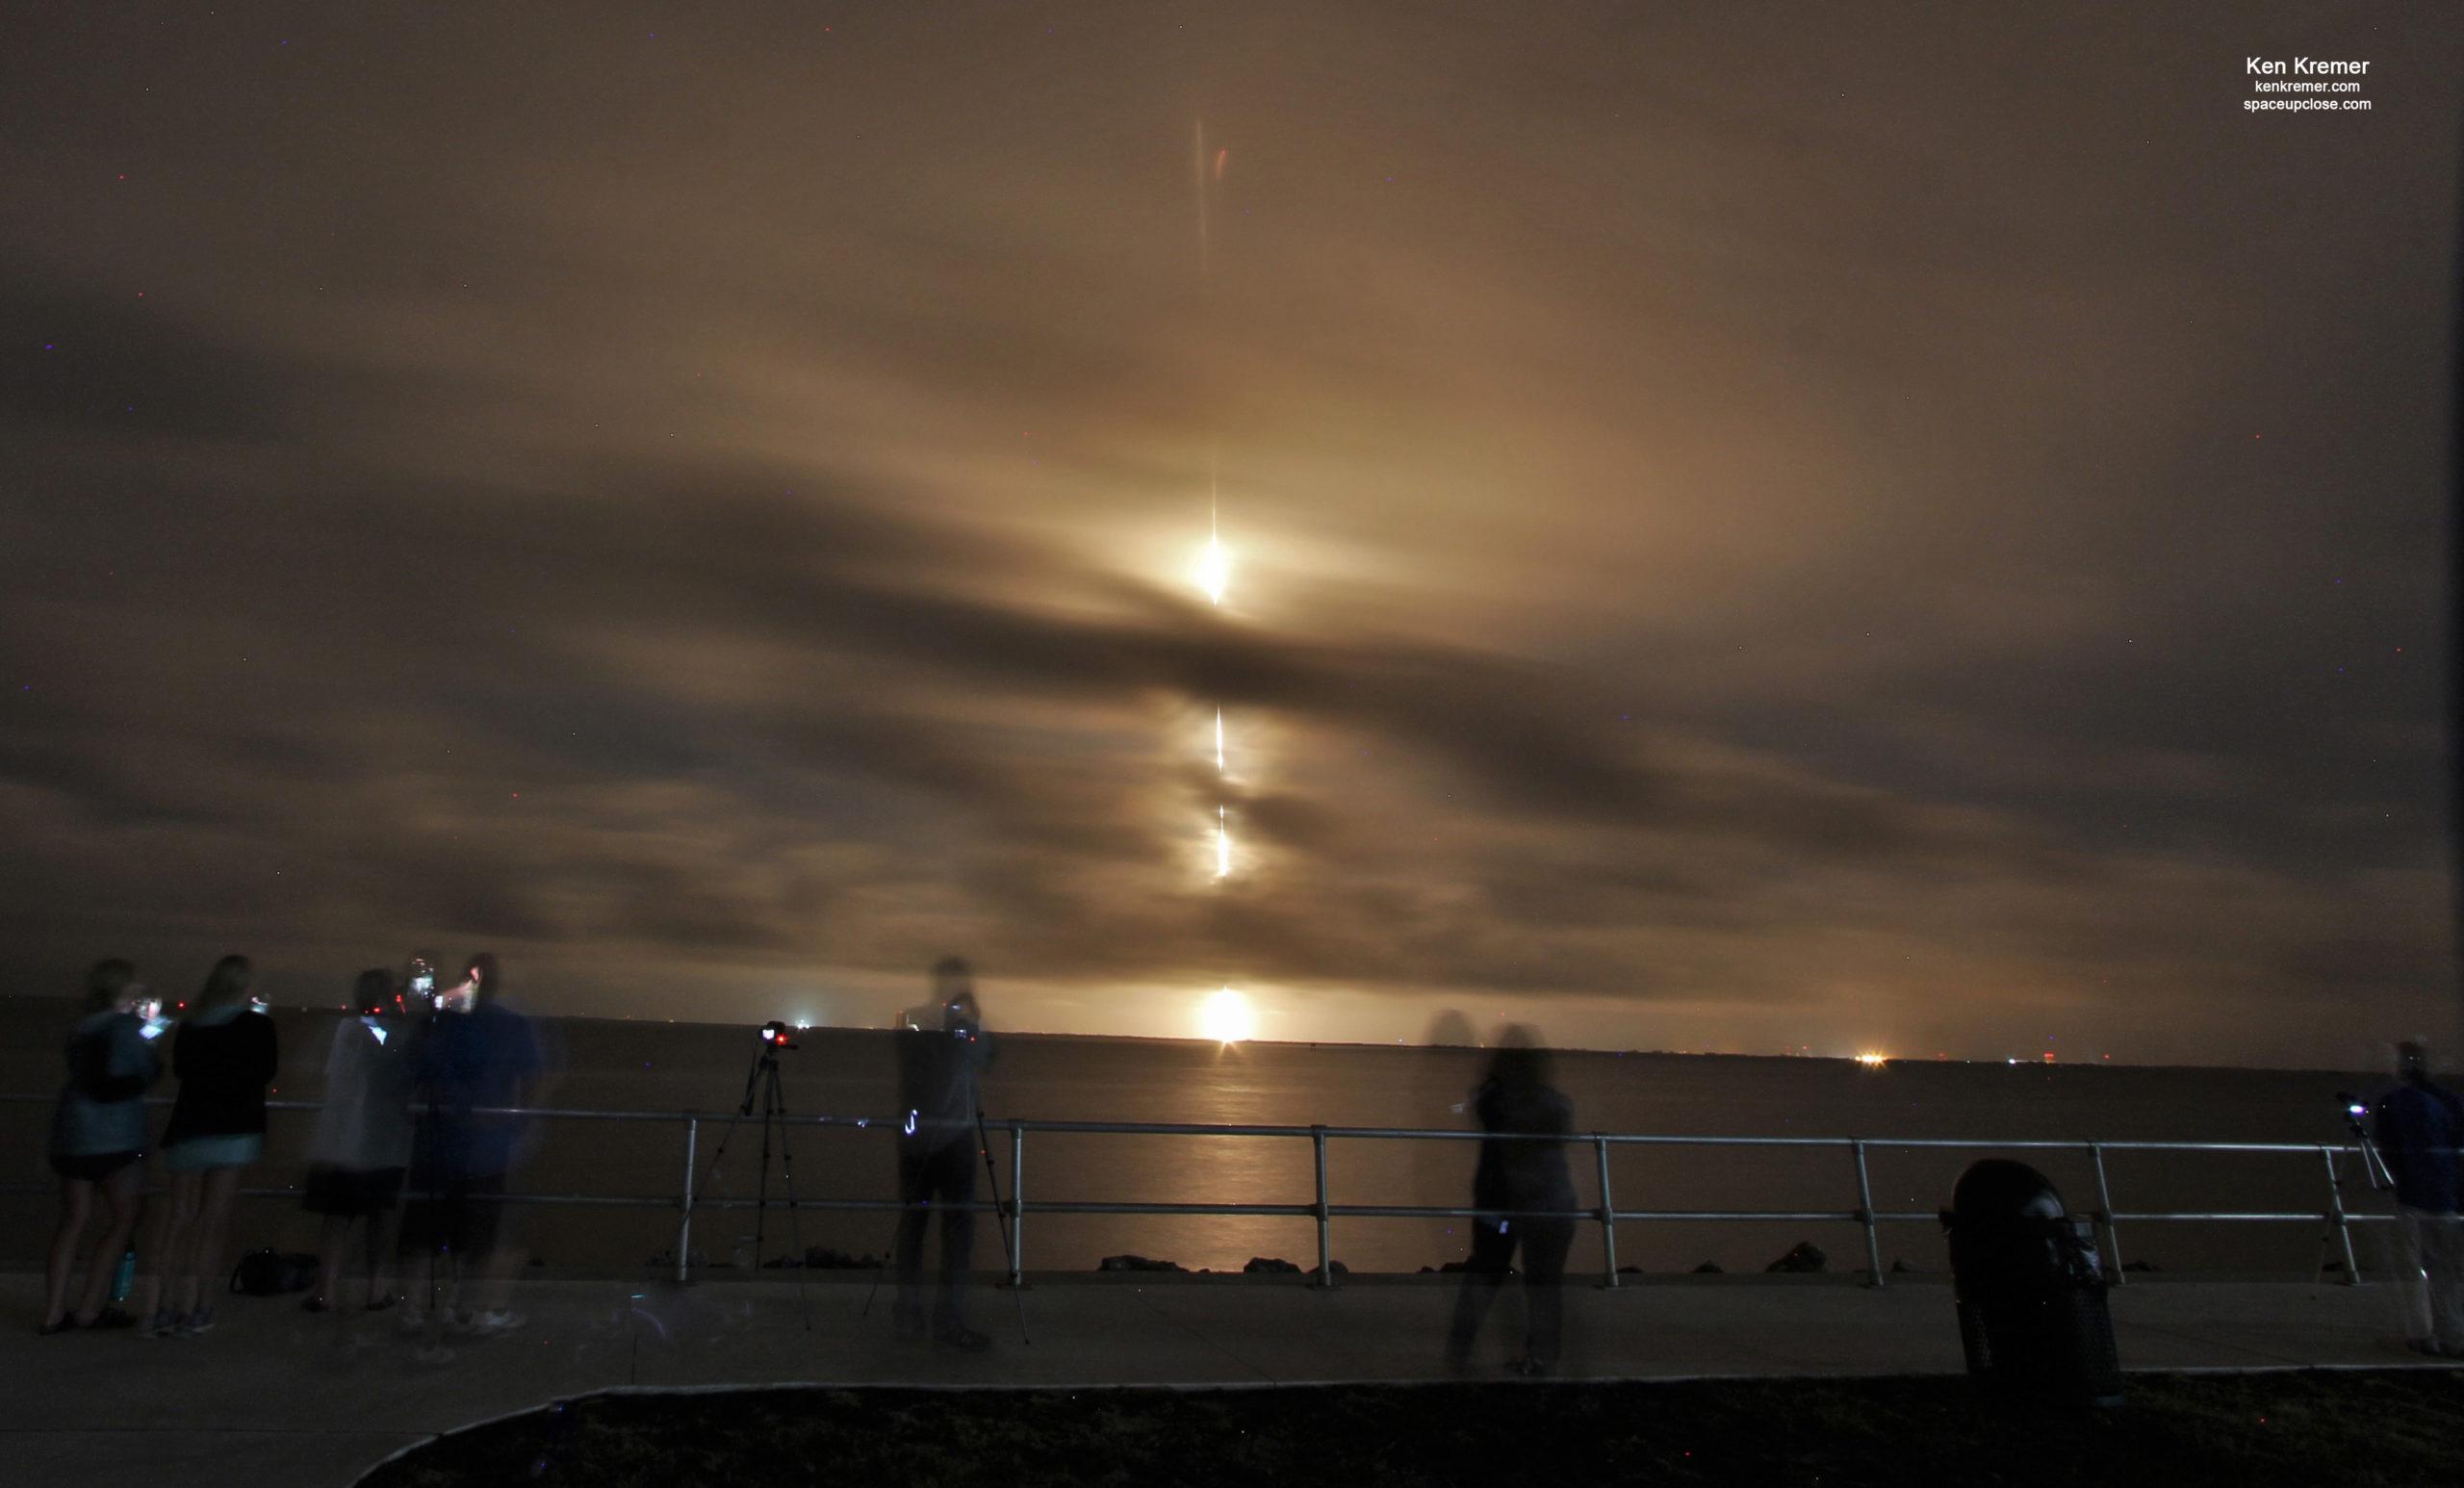 Midnight Sunday Streak Hurls SiriusXM SXM-8 Digital Radio Satellite to Orbit on SpaceX Falcon 9: Photos